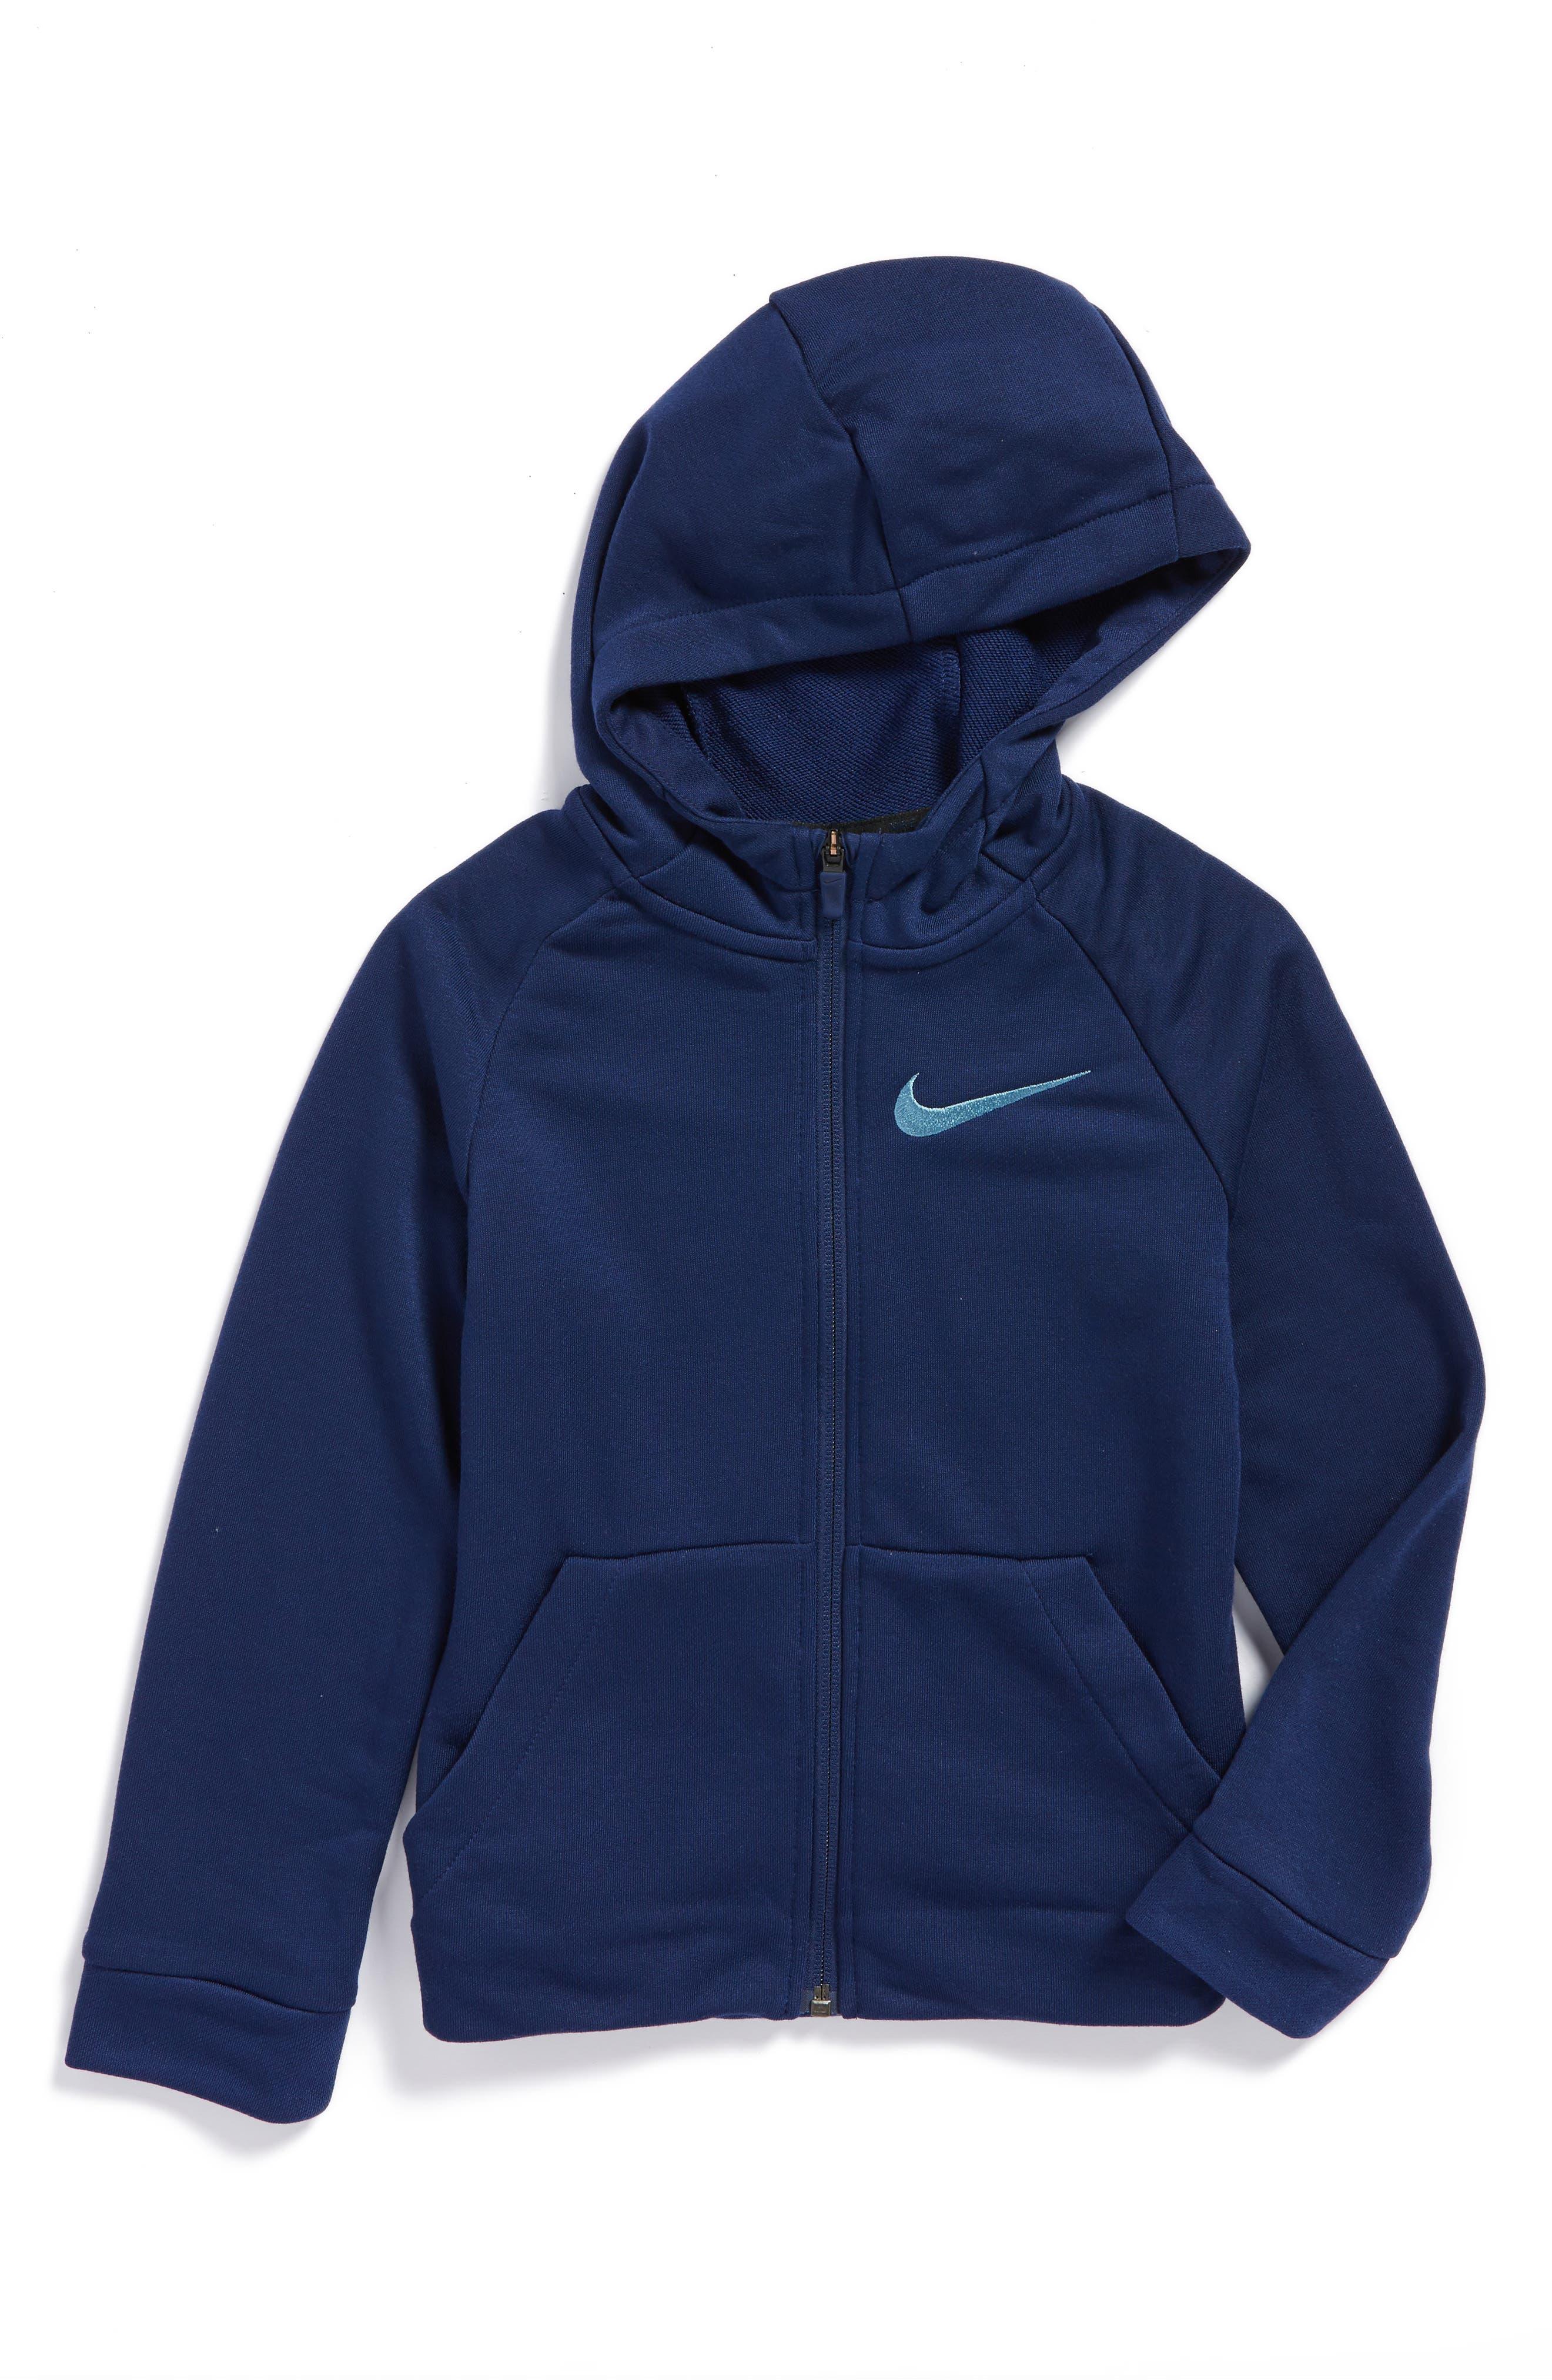 nike jumper kids brown online   OFF72% Discounts 4ce7460e2a